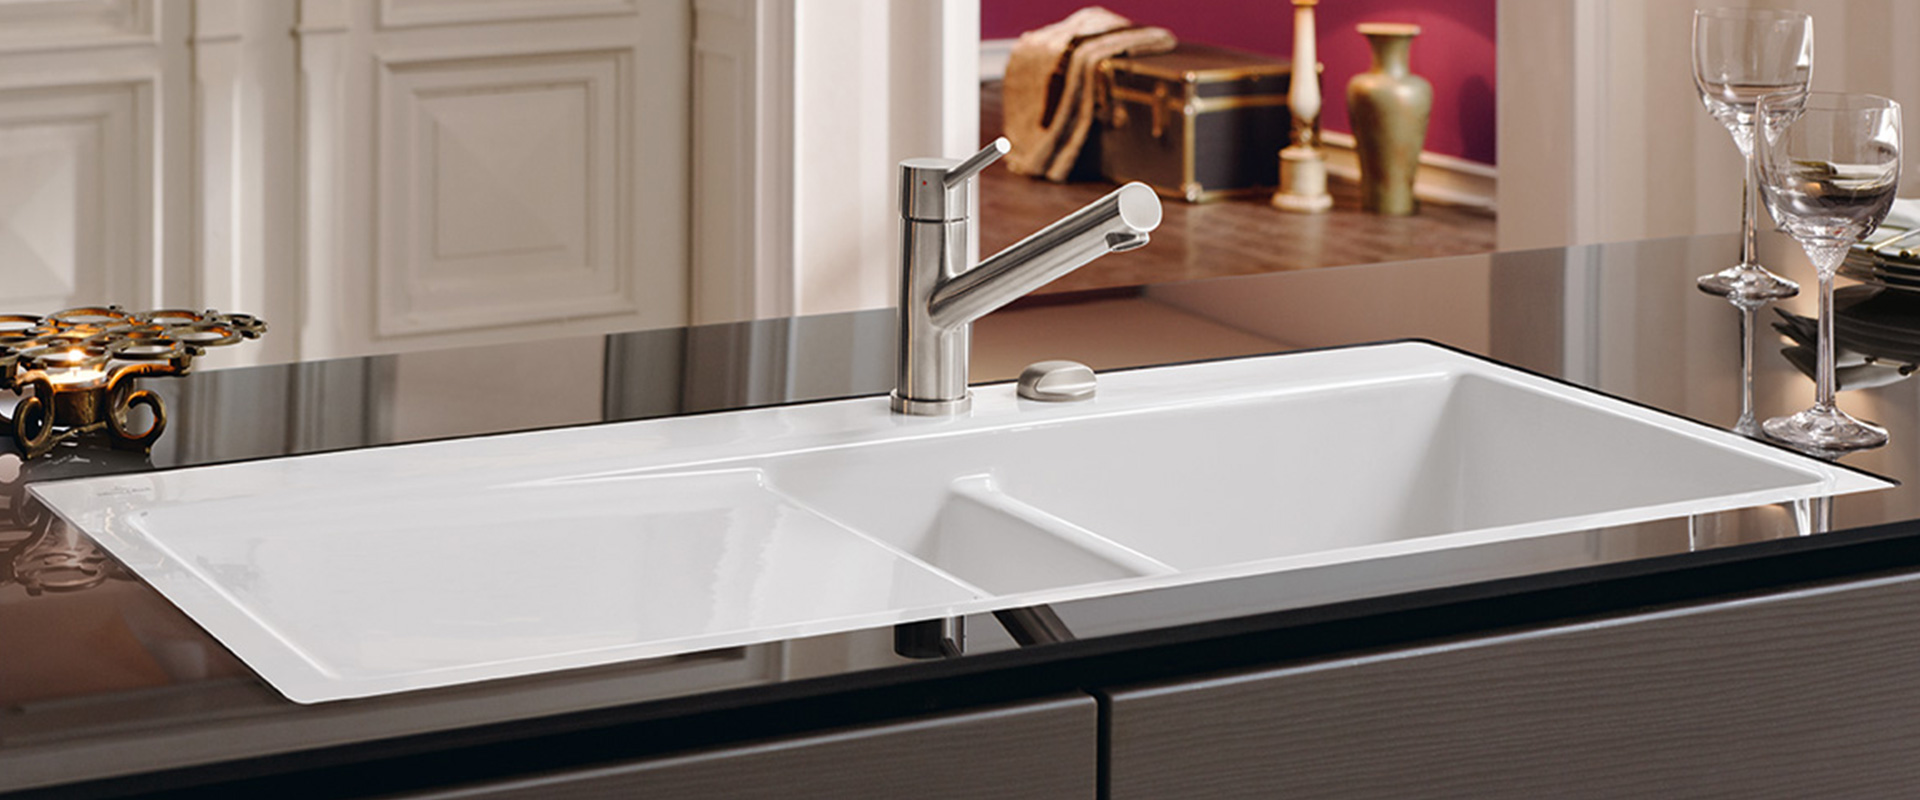 25 Villeroy Boch Sinks Kitchen